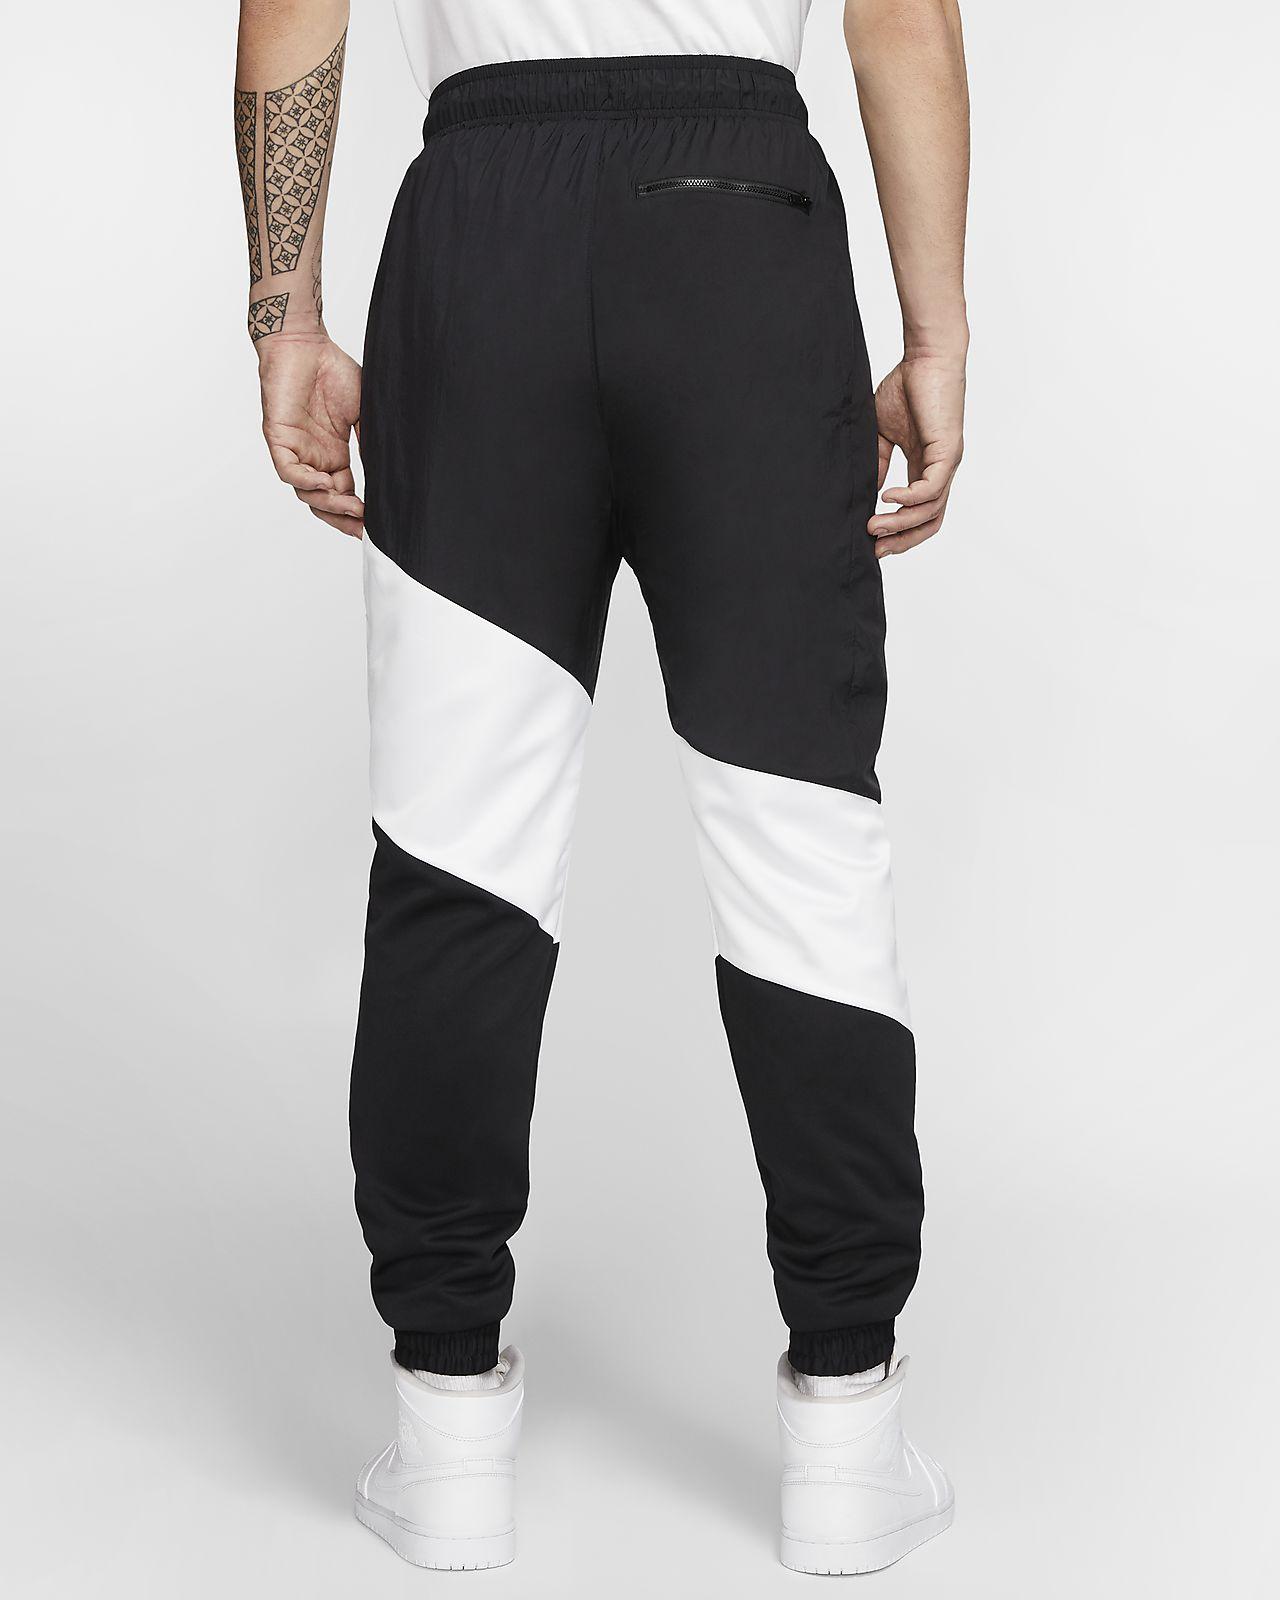 jordan jordan jordan nike pantalon nike noir pantalon nike